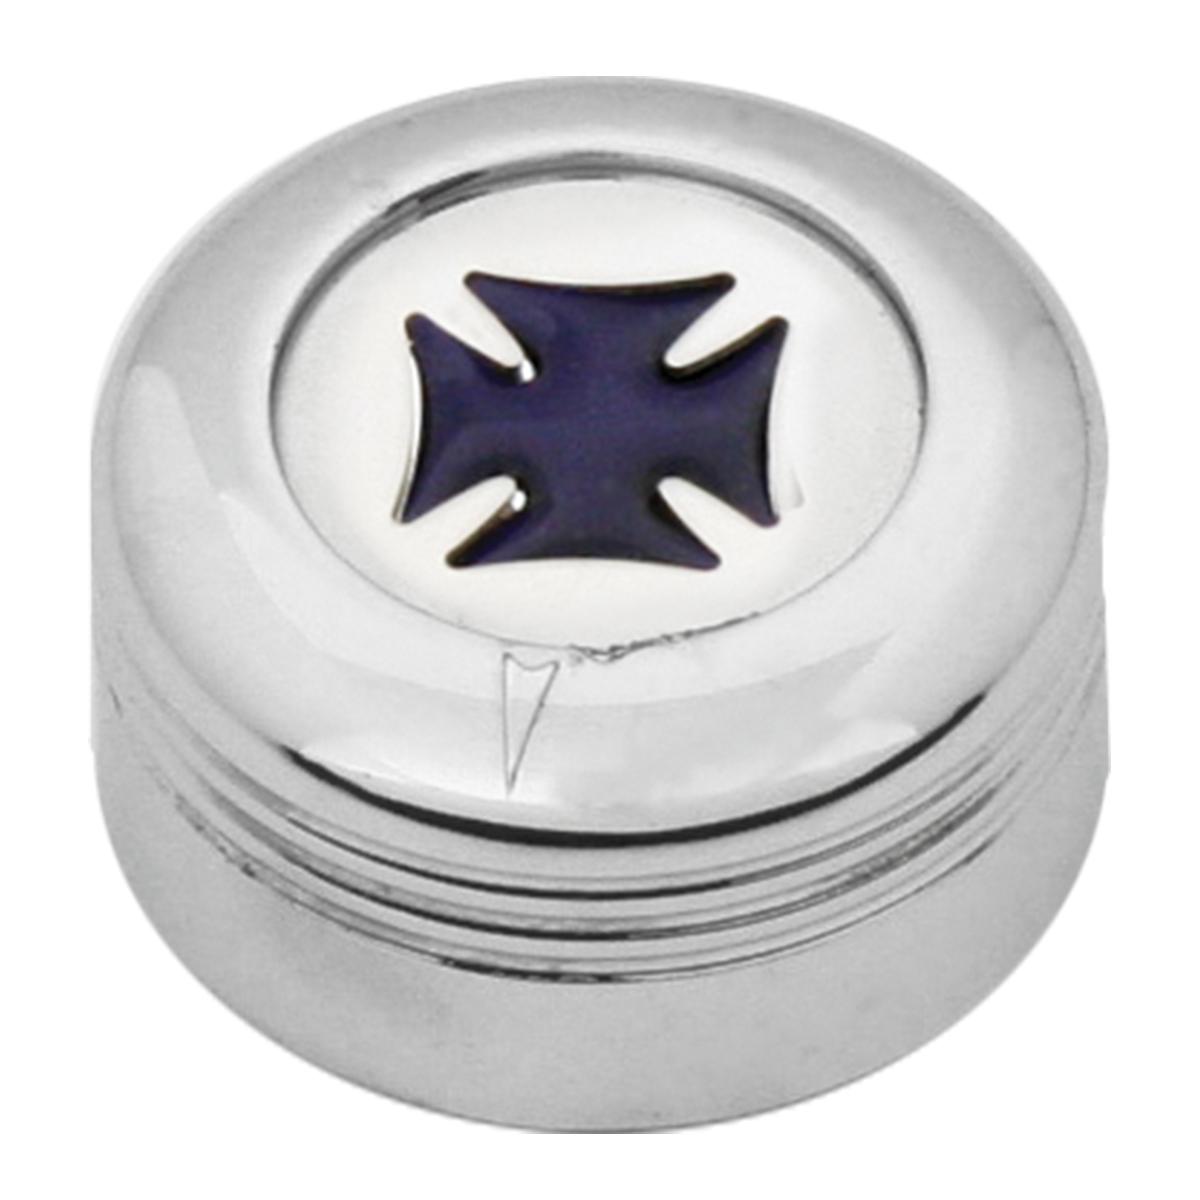 Chrome Plastic A/C Knob w/ Purple Iron Cross for Pete